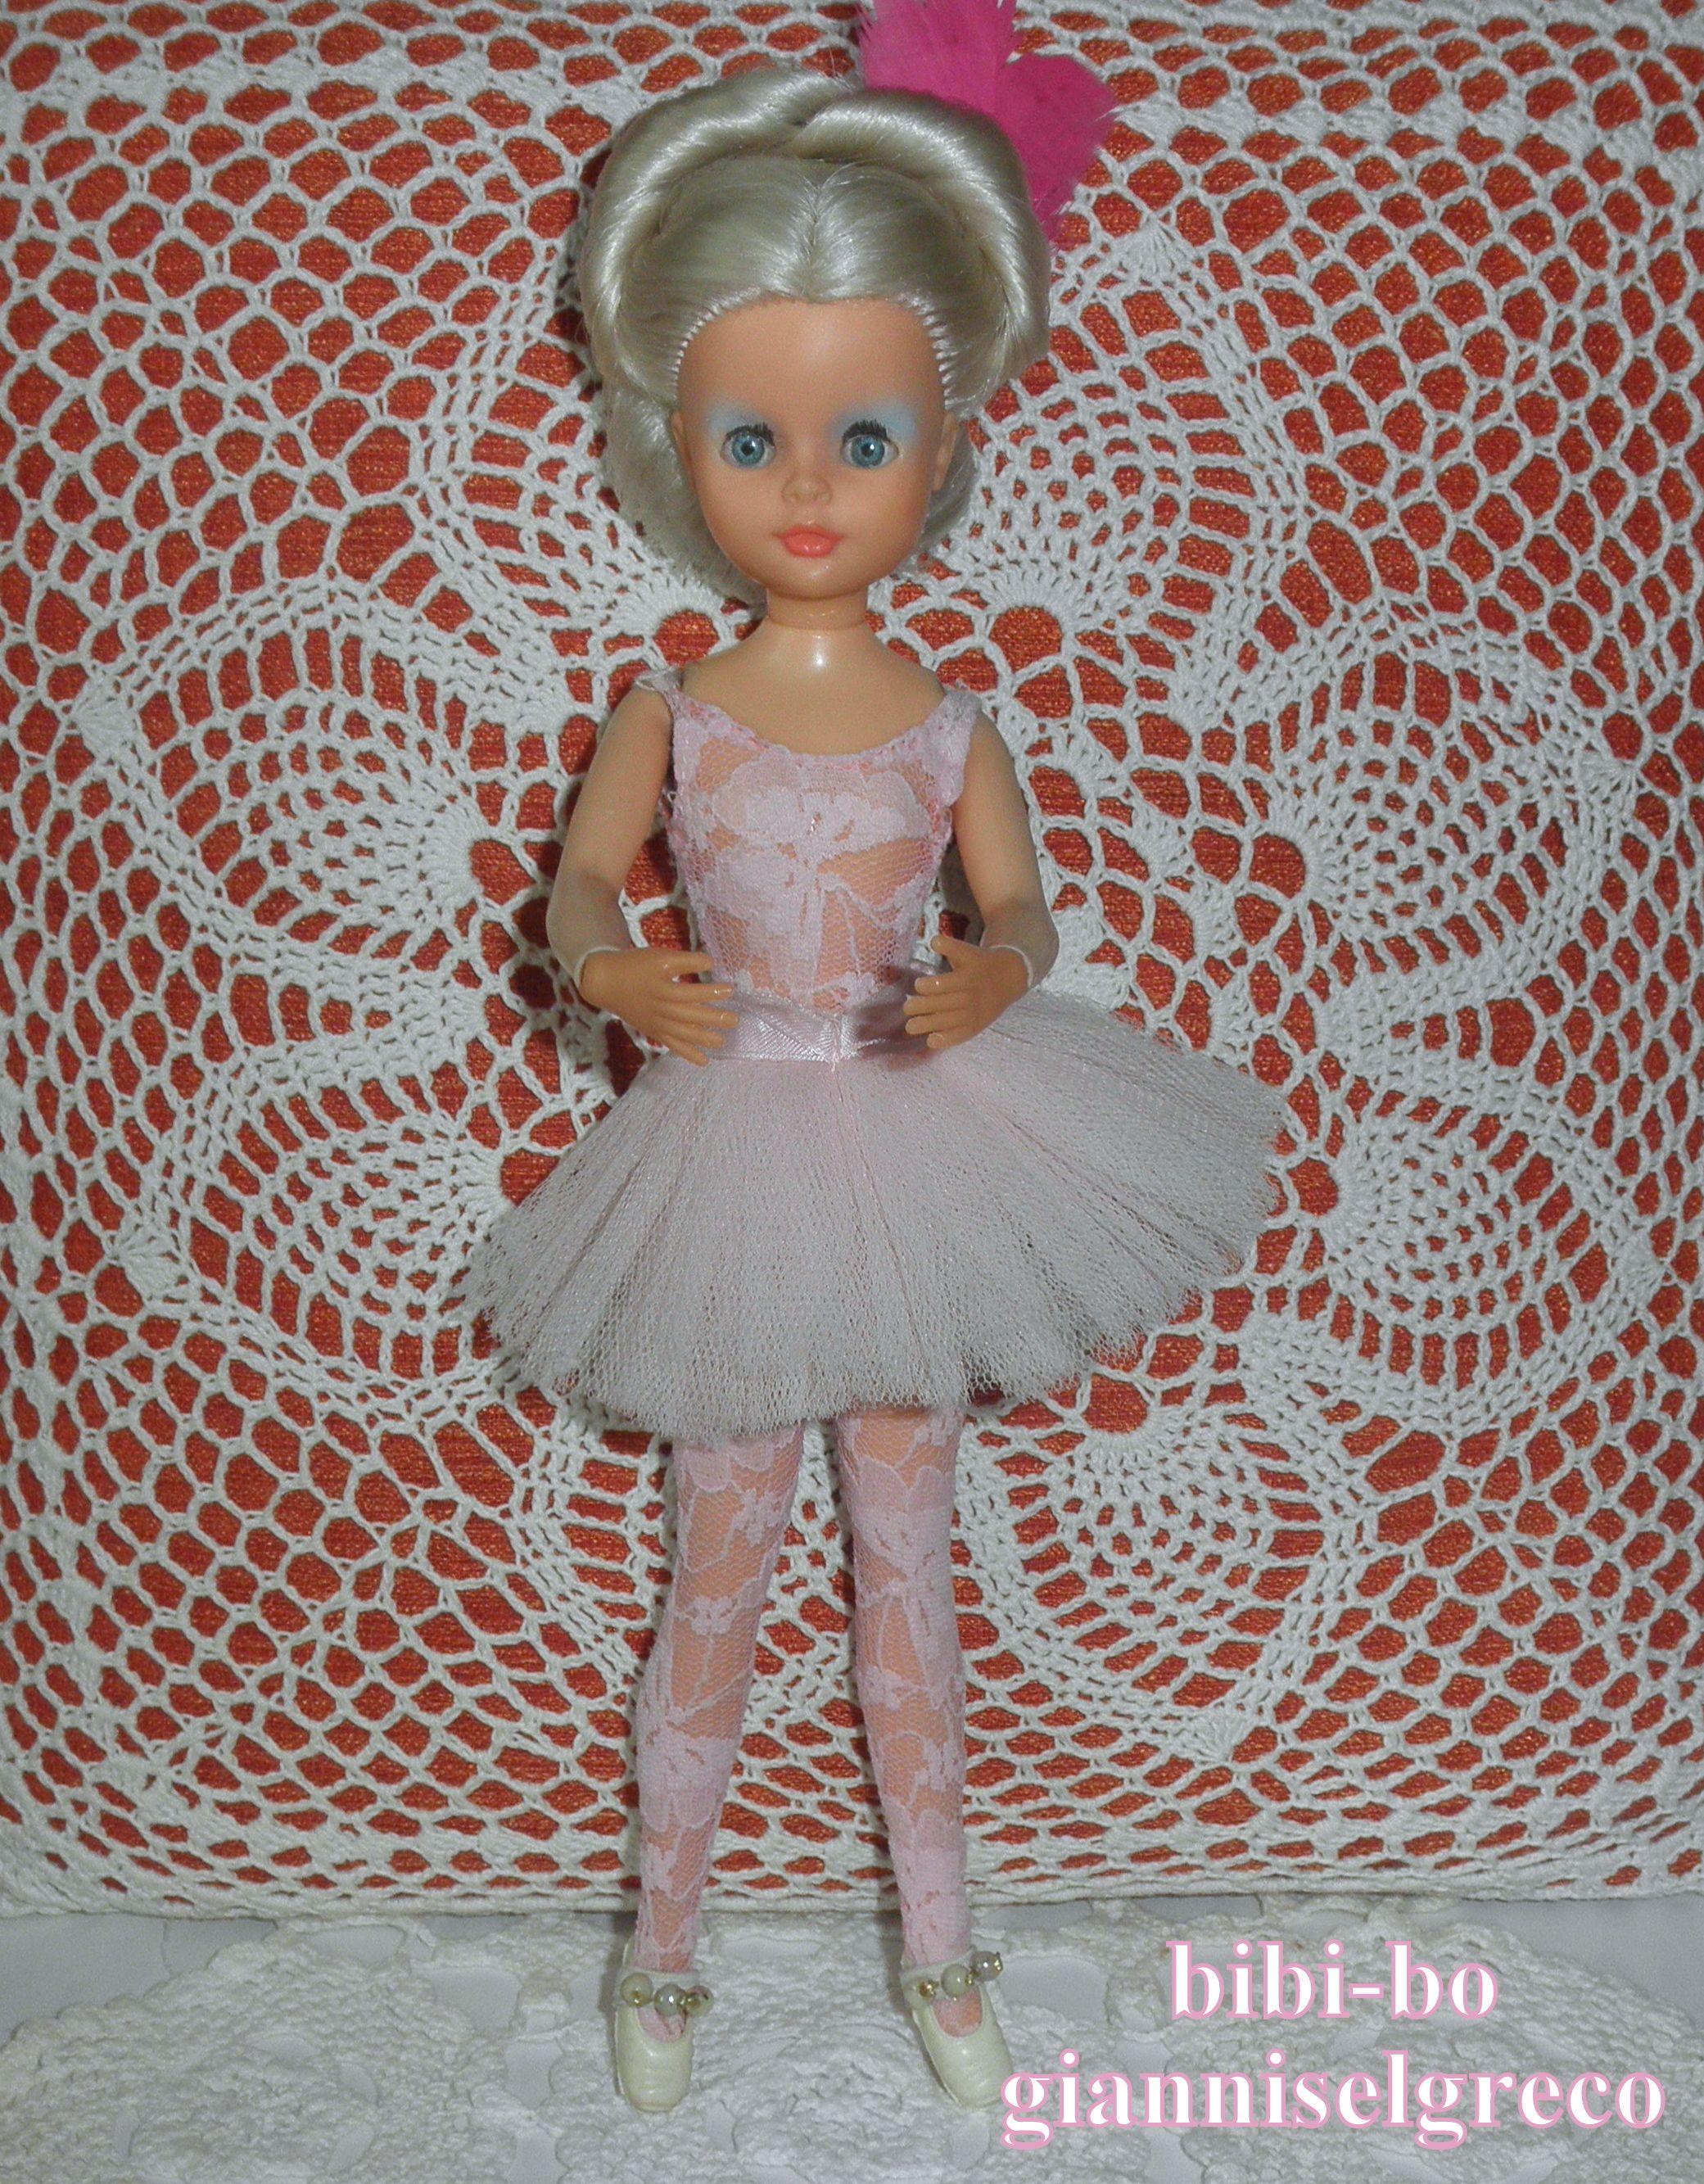 A bailarina bibi-bo é um dos mais amados bibi-bo! Биби-бо балерина је један од најомиљенијих Биби-бо! ビビ-BOのバレリーナは、最も愛さビビ-BOの一つです! راقصة الباليه بيبي بو هو واحد من أكثر الحبيب بيبي بو!